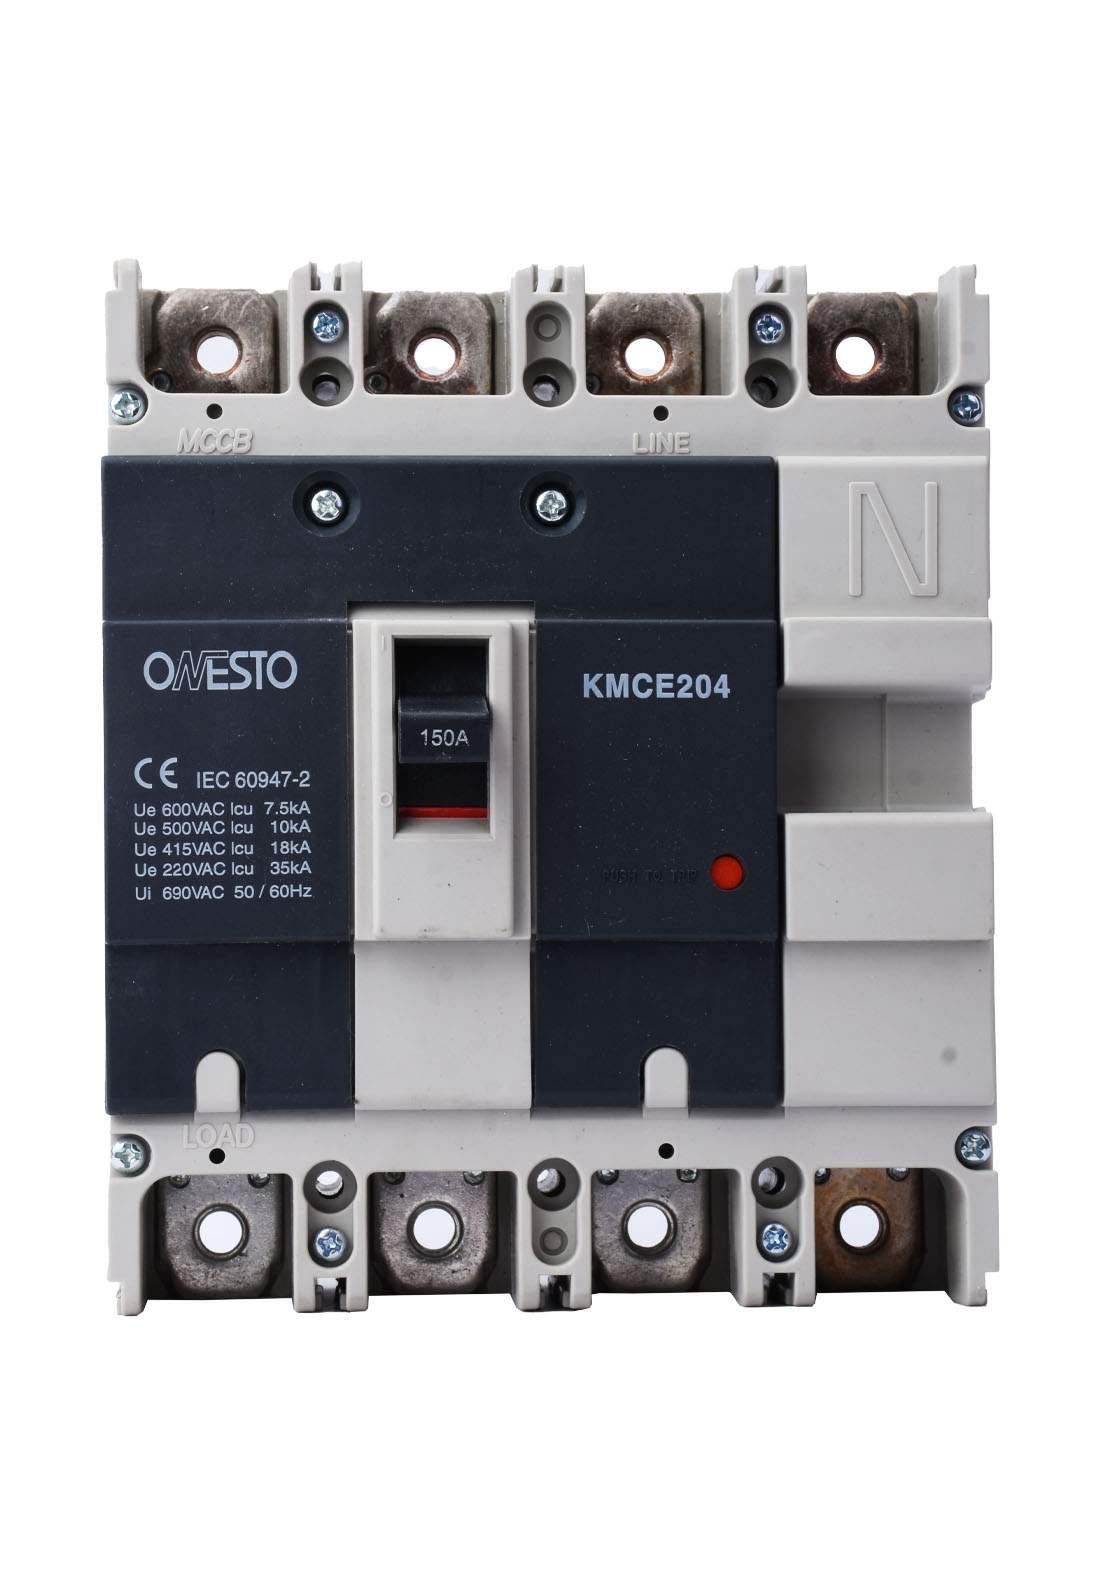 Onesto KMCE204 Circuit Breaker 150 A قاطع تيار الكهرباء هوائي (جوزة)